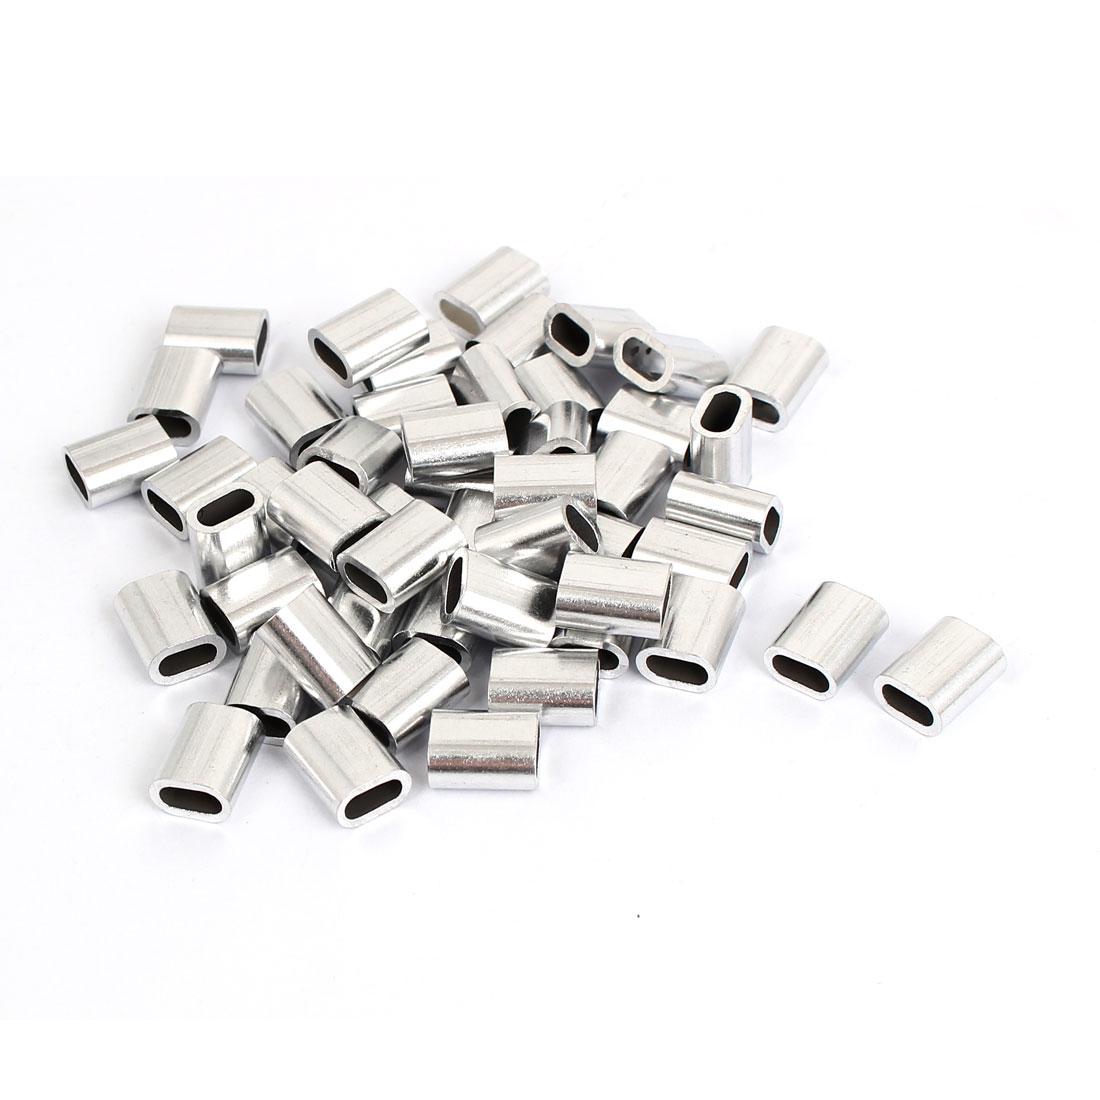 50 Pcs M3 Aluminium Ferrule Cable Crimps Sleeves Silver Tone